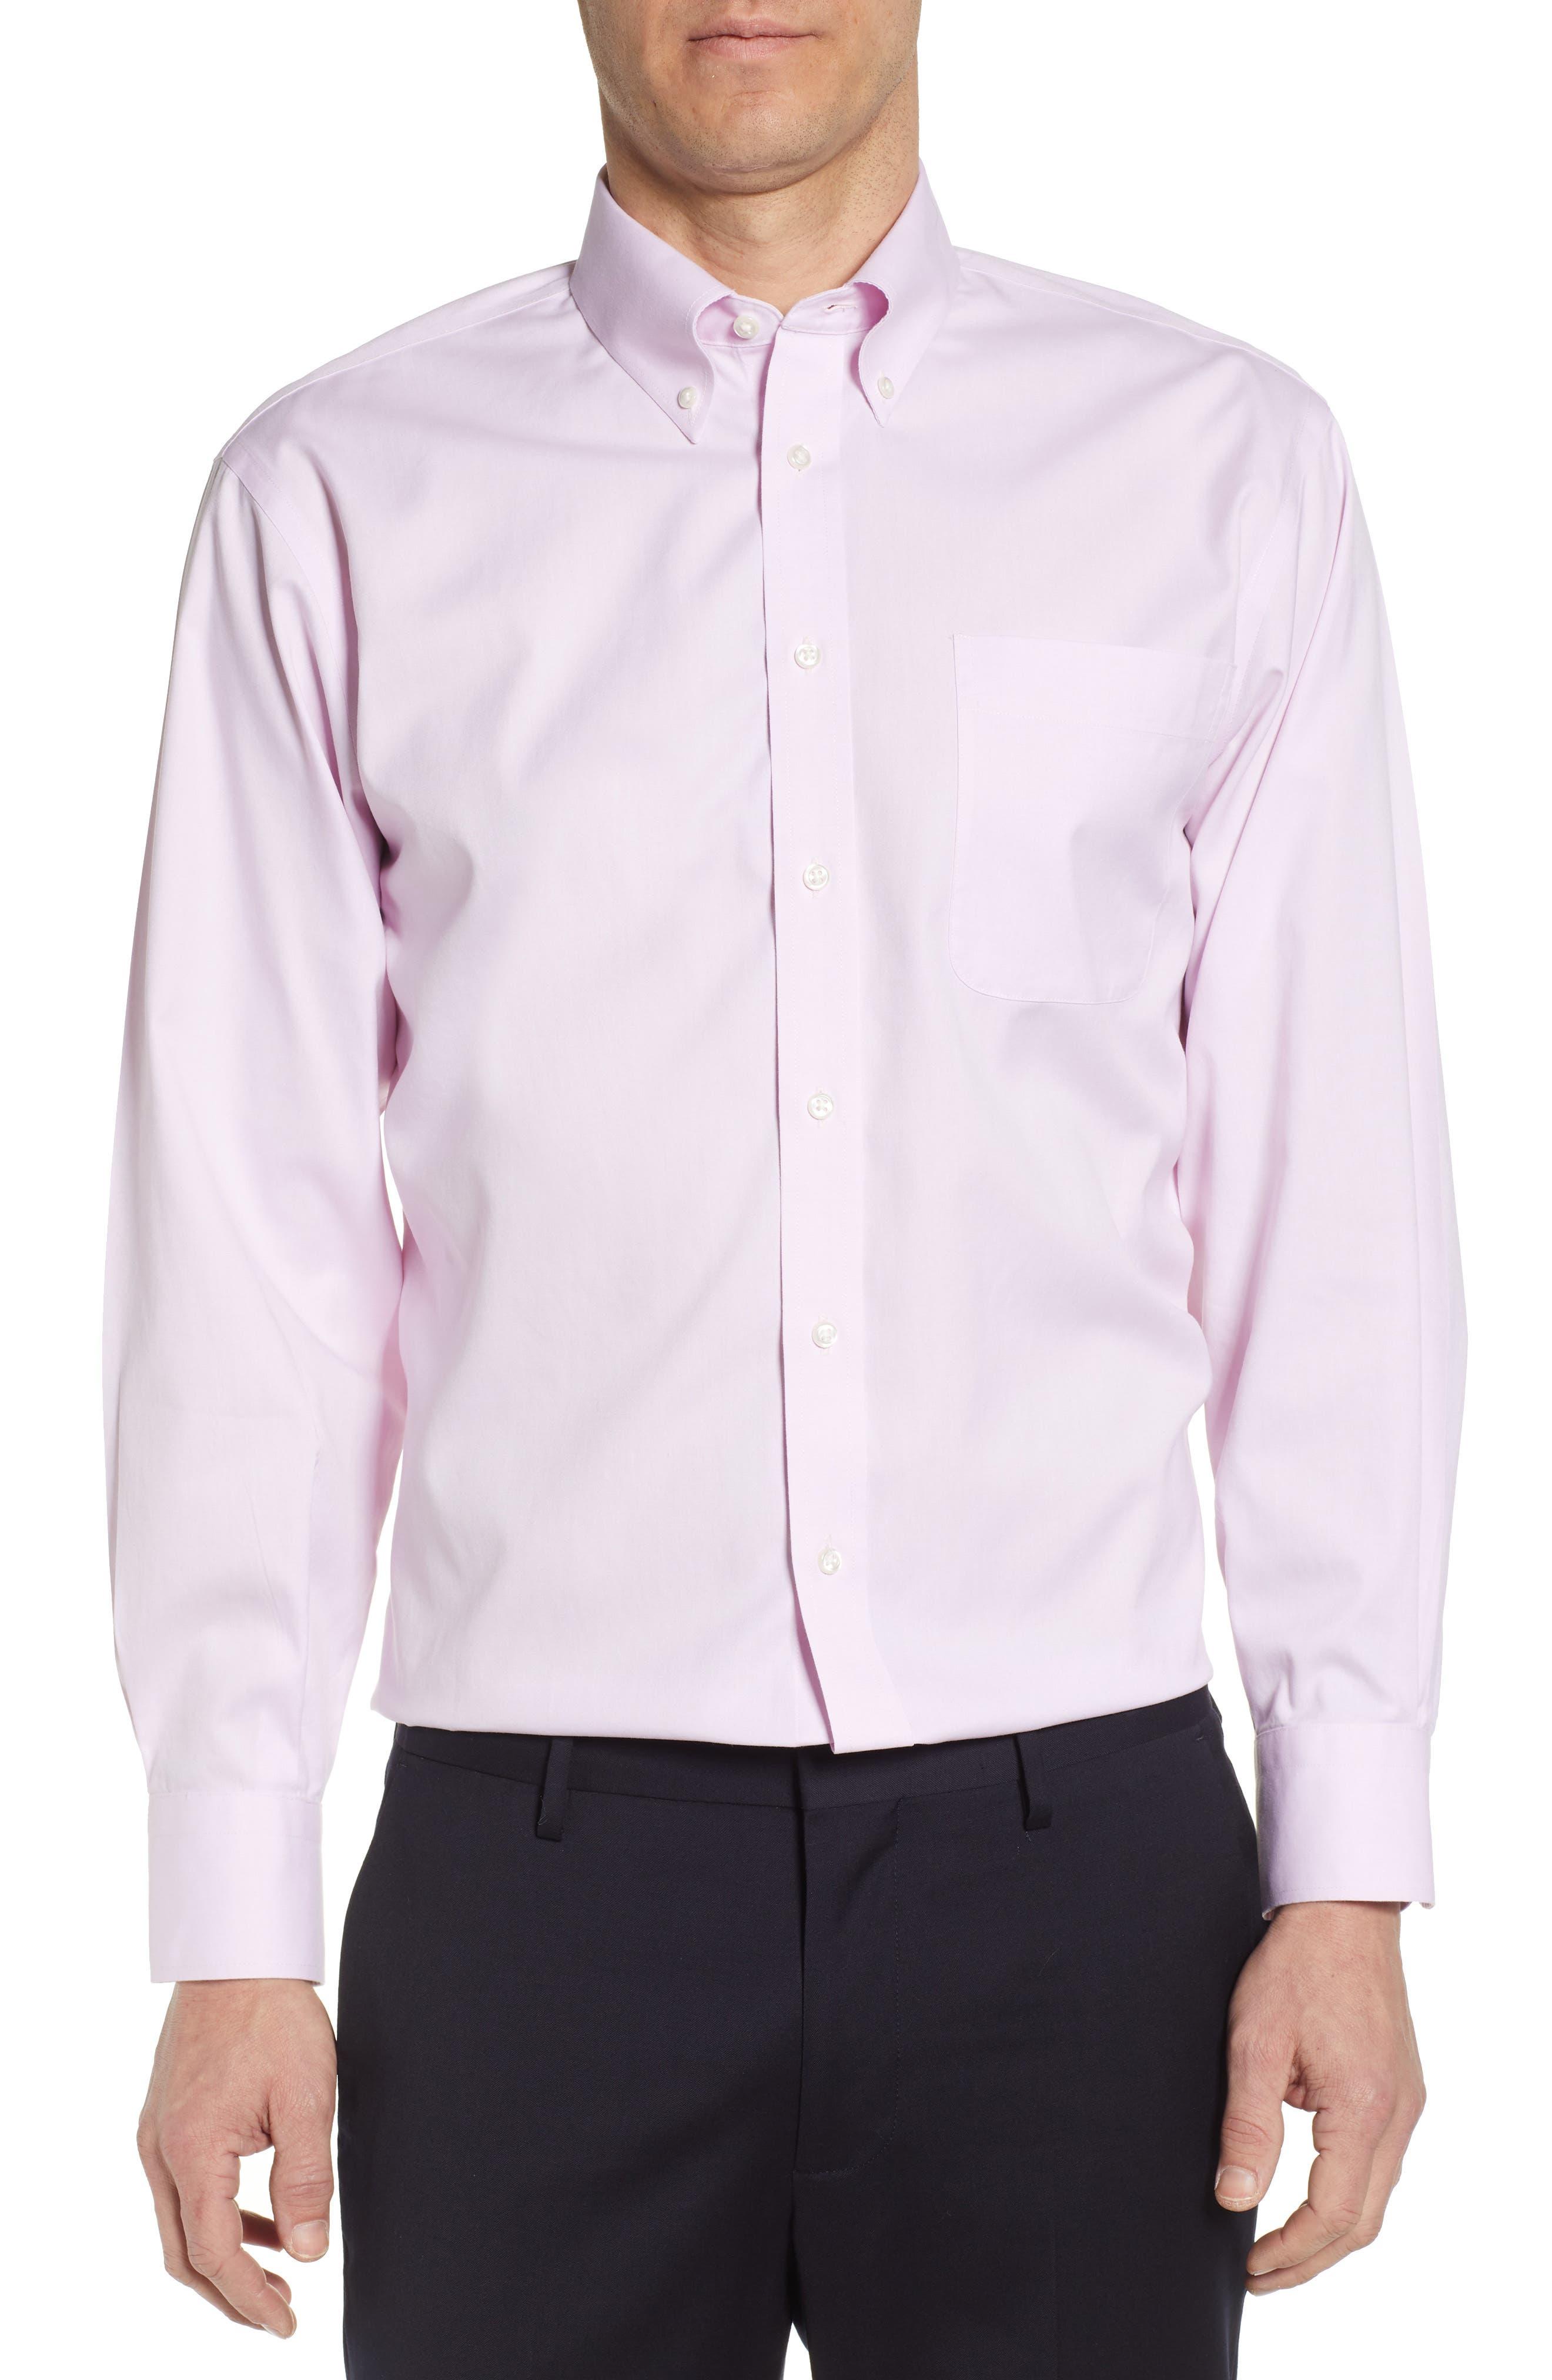 Nordstrom Shop Smartcare(TM) Classic Fit Dress Shirt - Pink